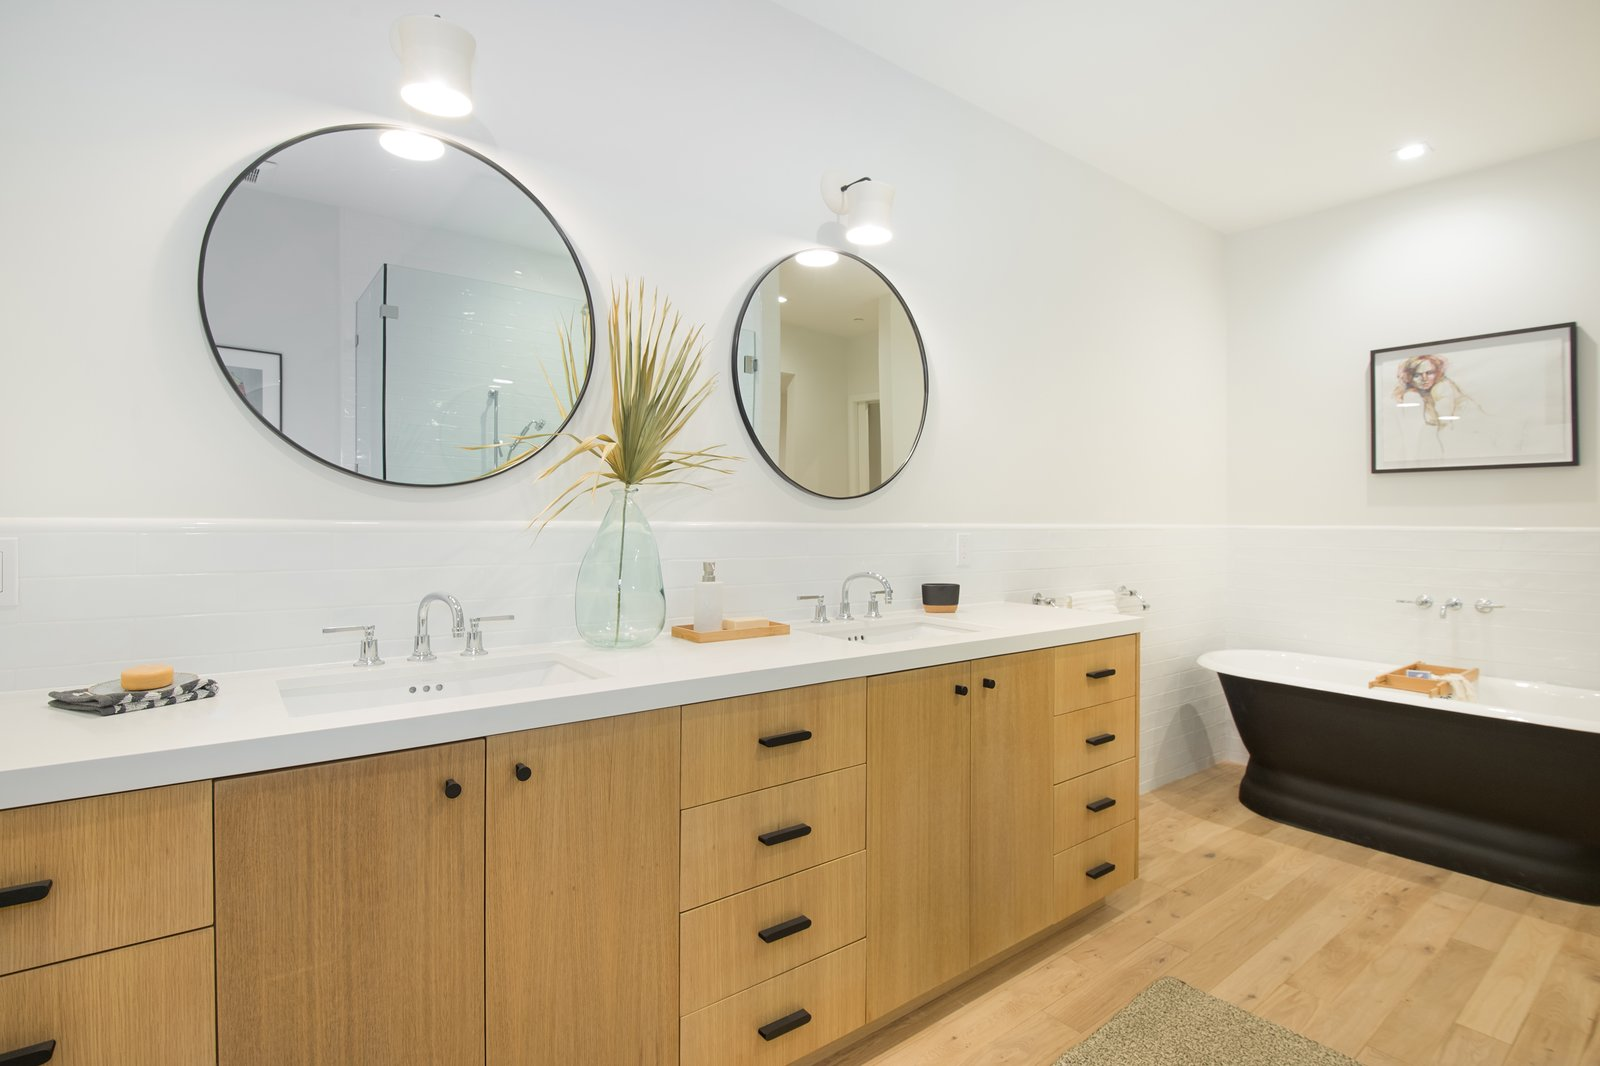 Bath Room, Subway Tile Wall, Ceiling Lighting, Medium Hardwood Floor, Recessed Lighting, Engineered Quartz Counter, Freestanding Tub, and Undermount Sink Master Bathroom  SL House by ANX / Aaron Neubert Architects